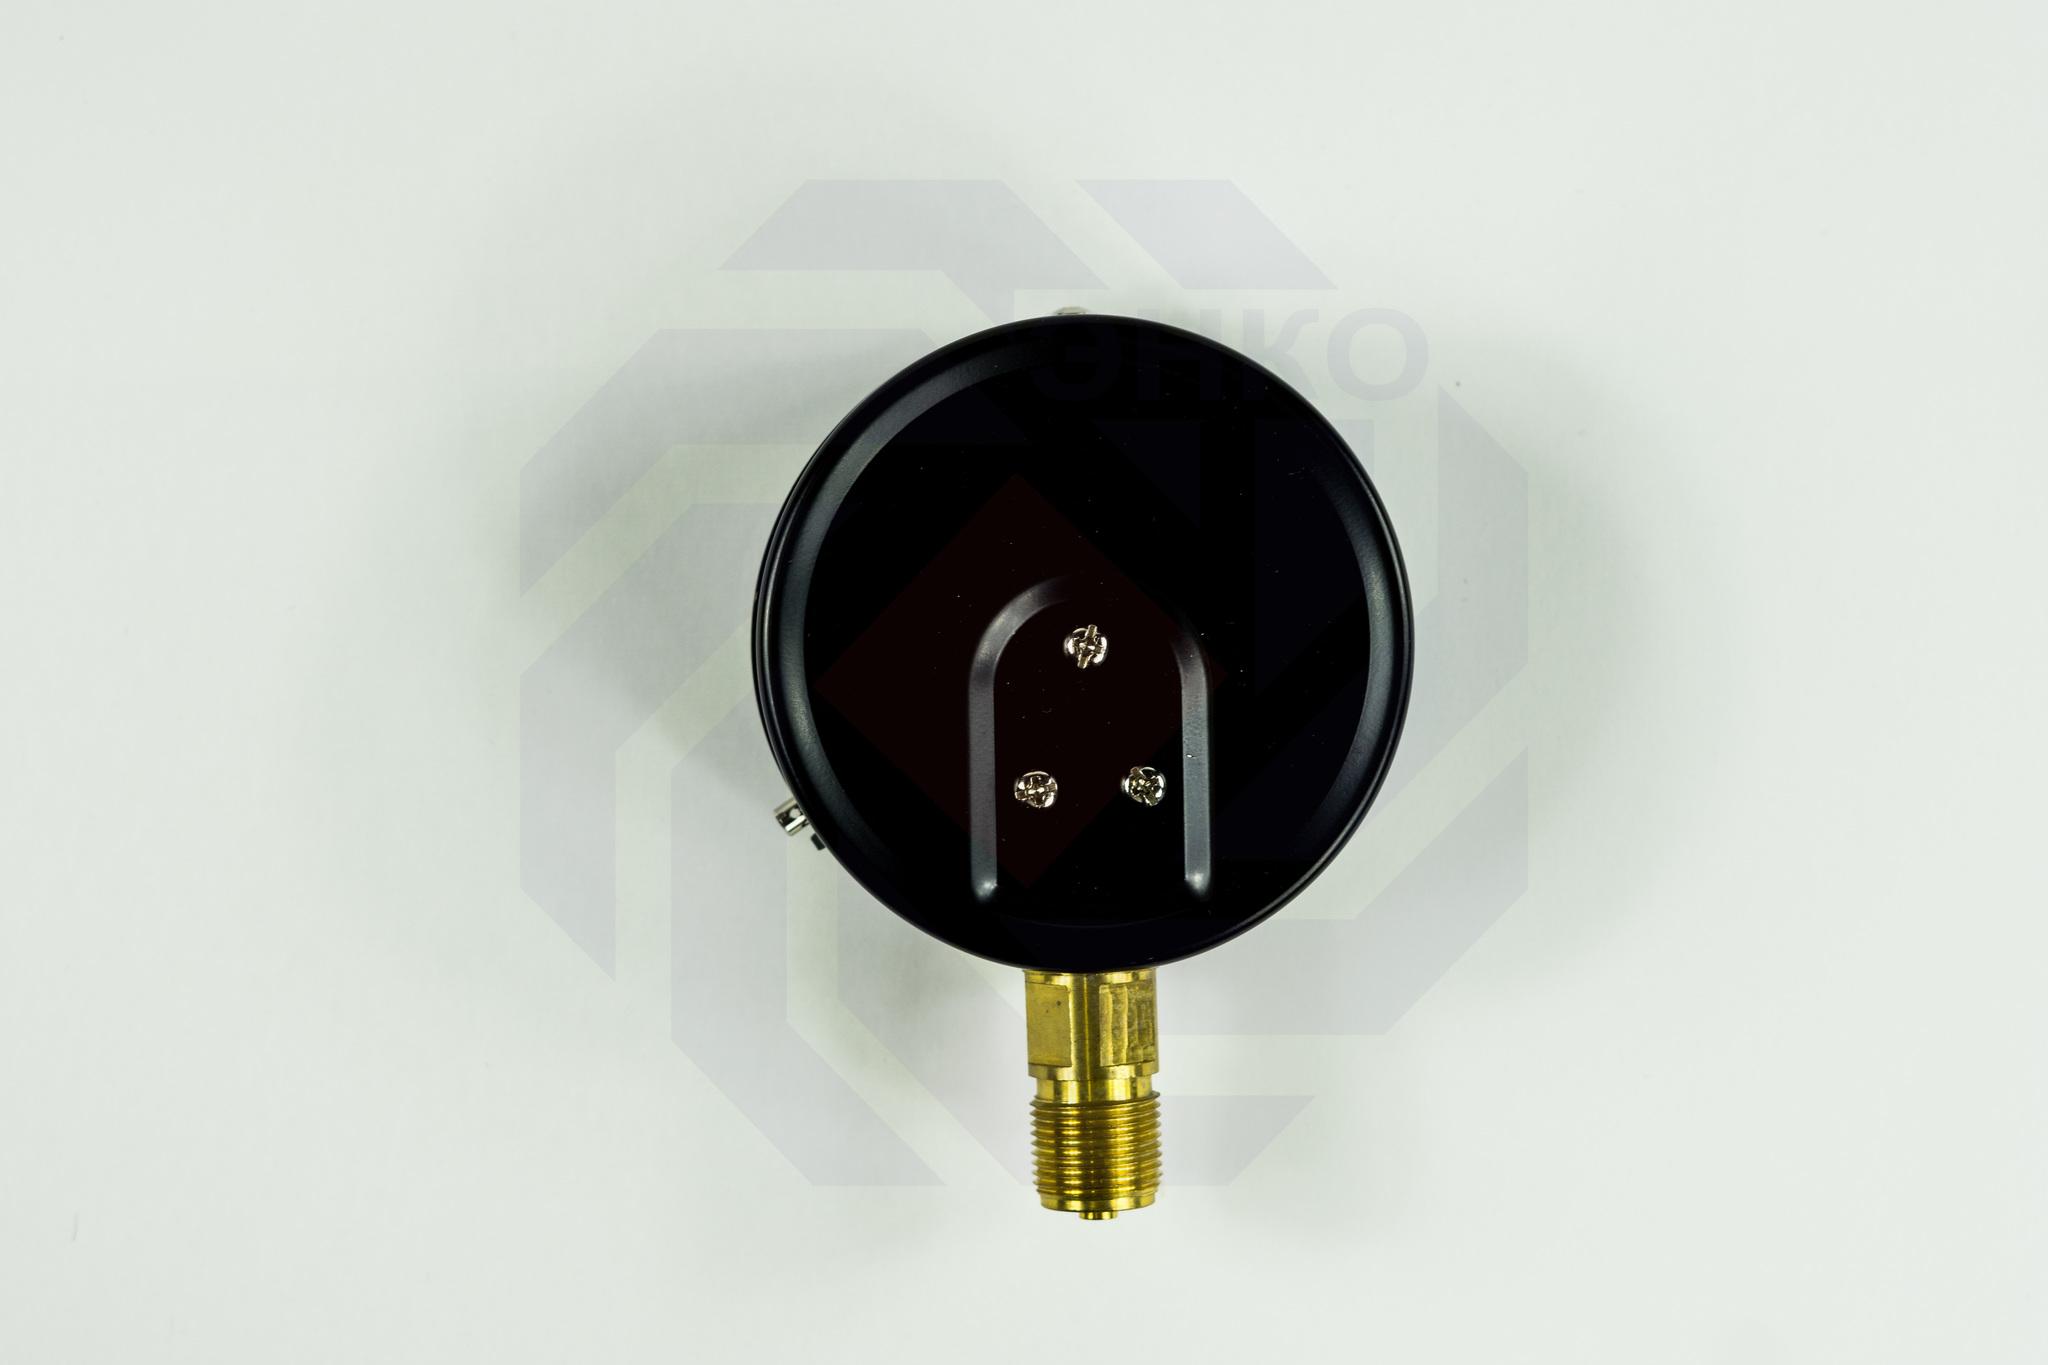 Манометр радиальный ЮМАС МП100М 0-2,5 МПа 100 мм M20⨯1,5